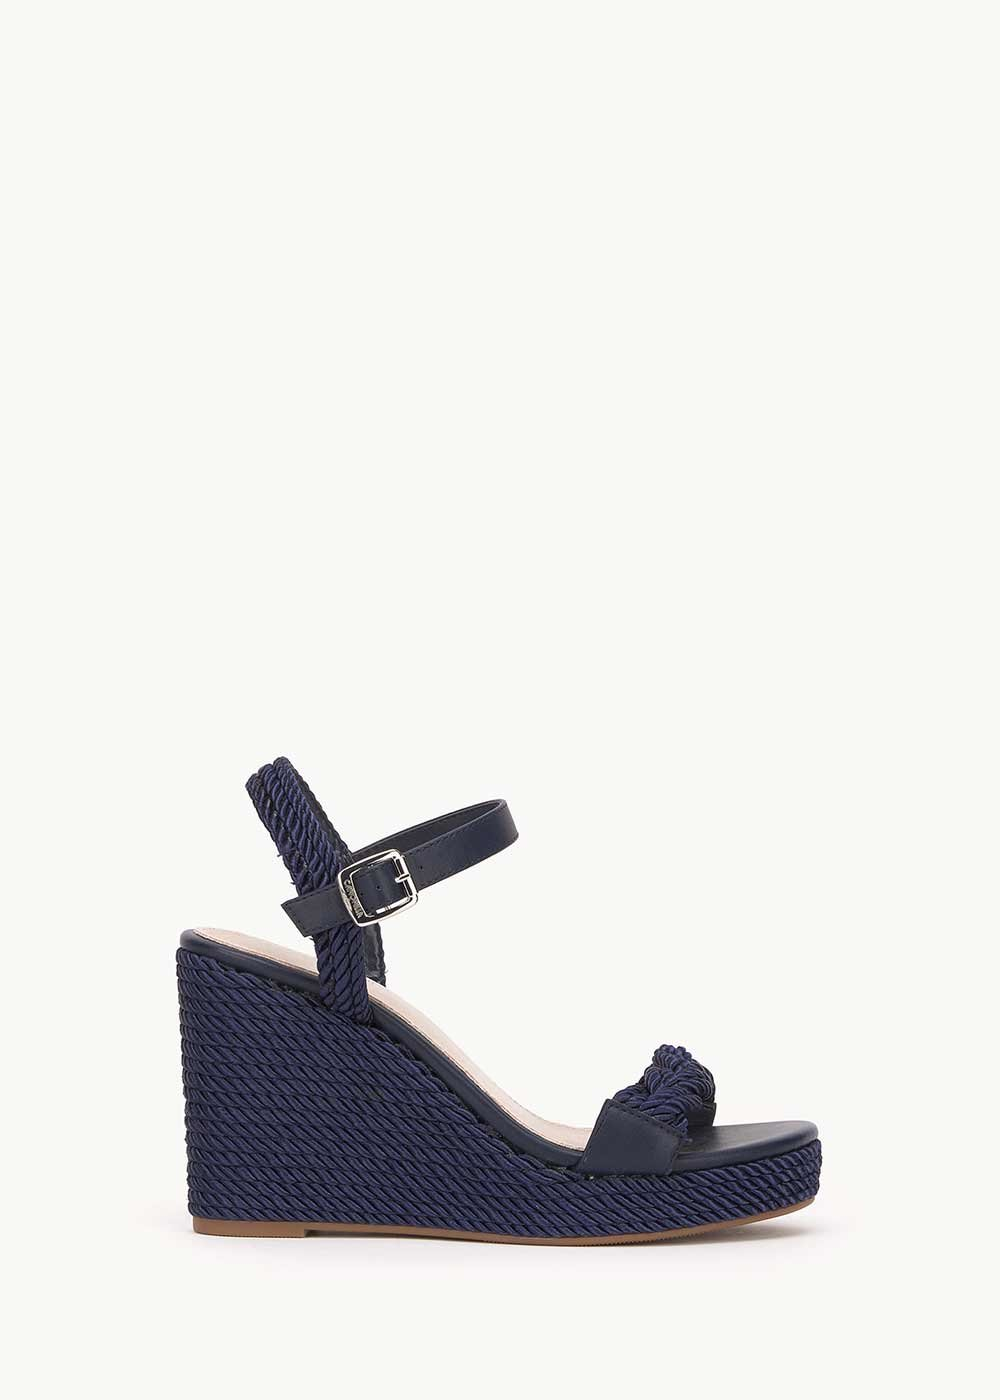 Susannah sandal with rope detail - Medium Blue - Woman